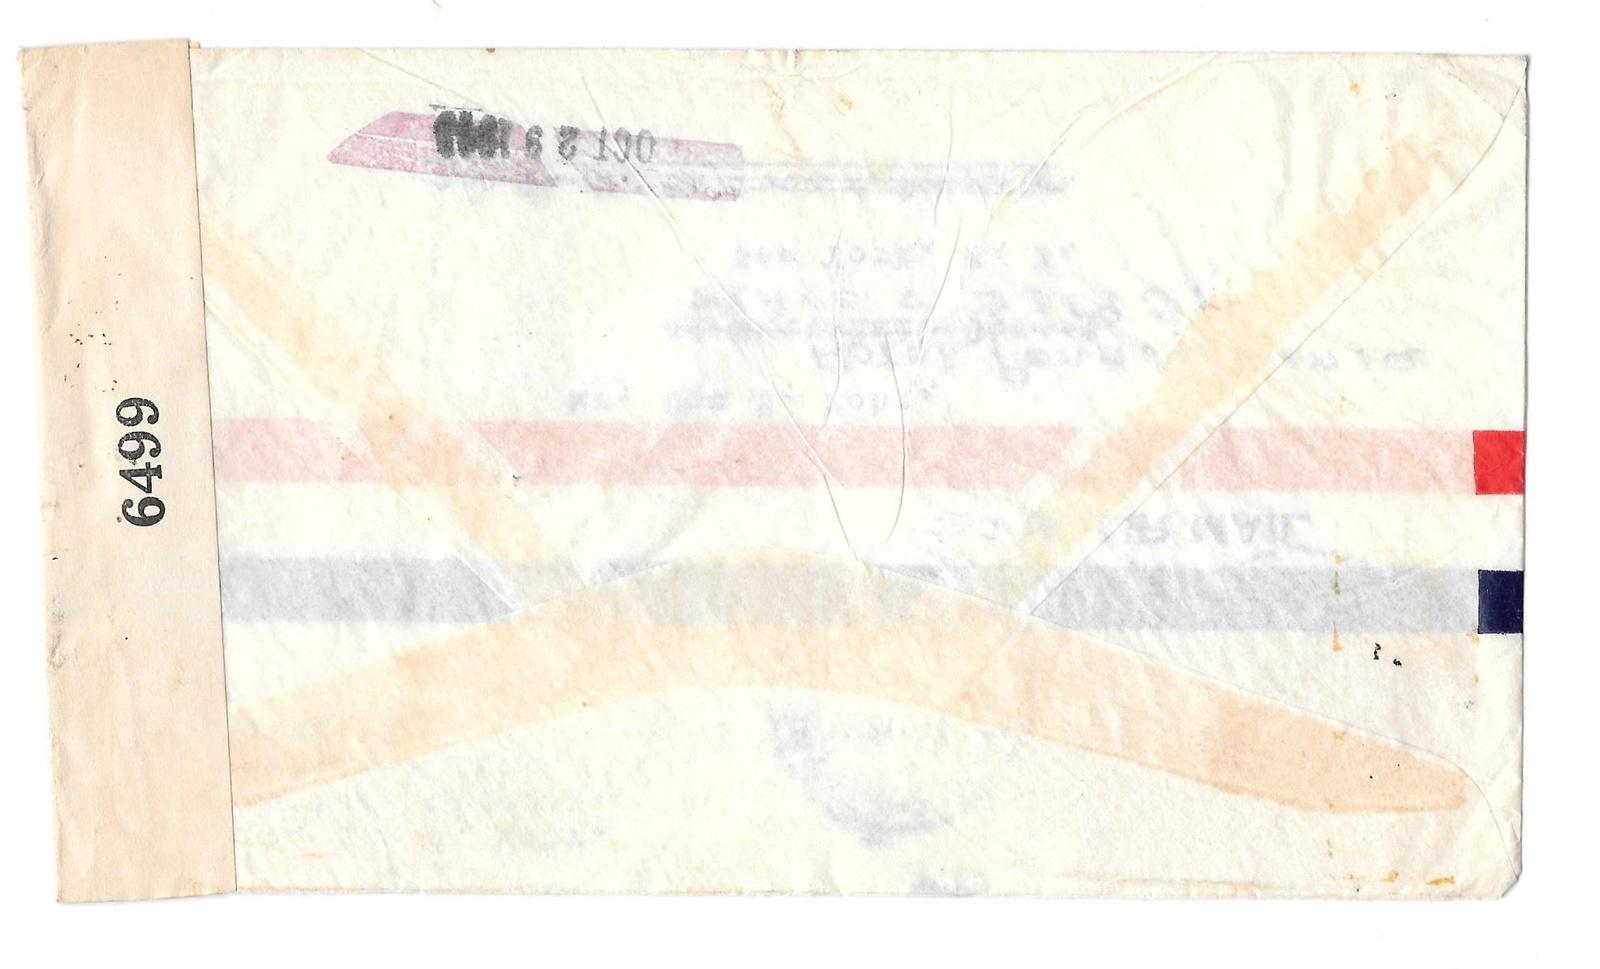 Haiti Censored 1943 Airmail Cover Sc C22 Port au Prince to US Examiner 6499